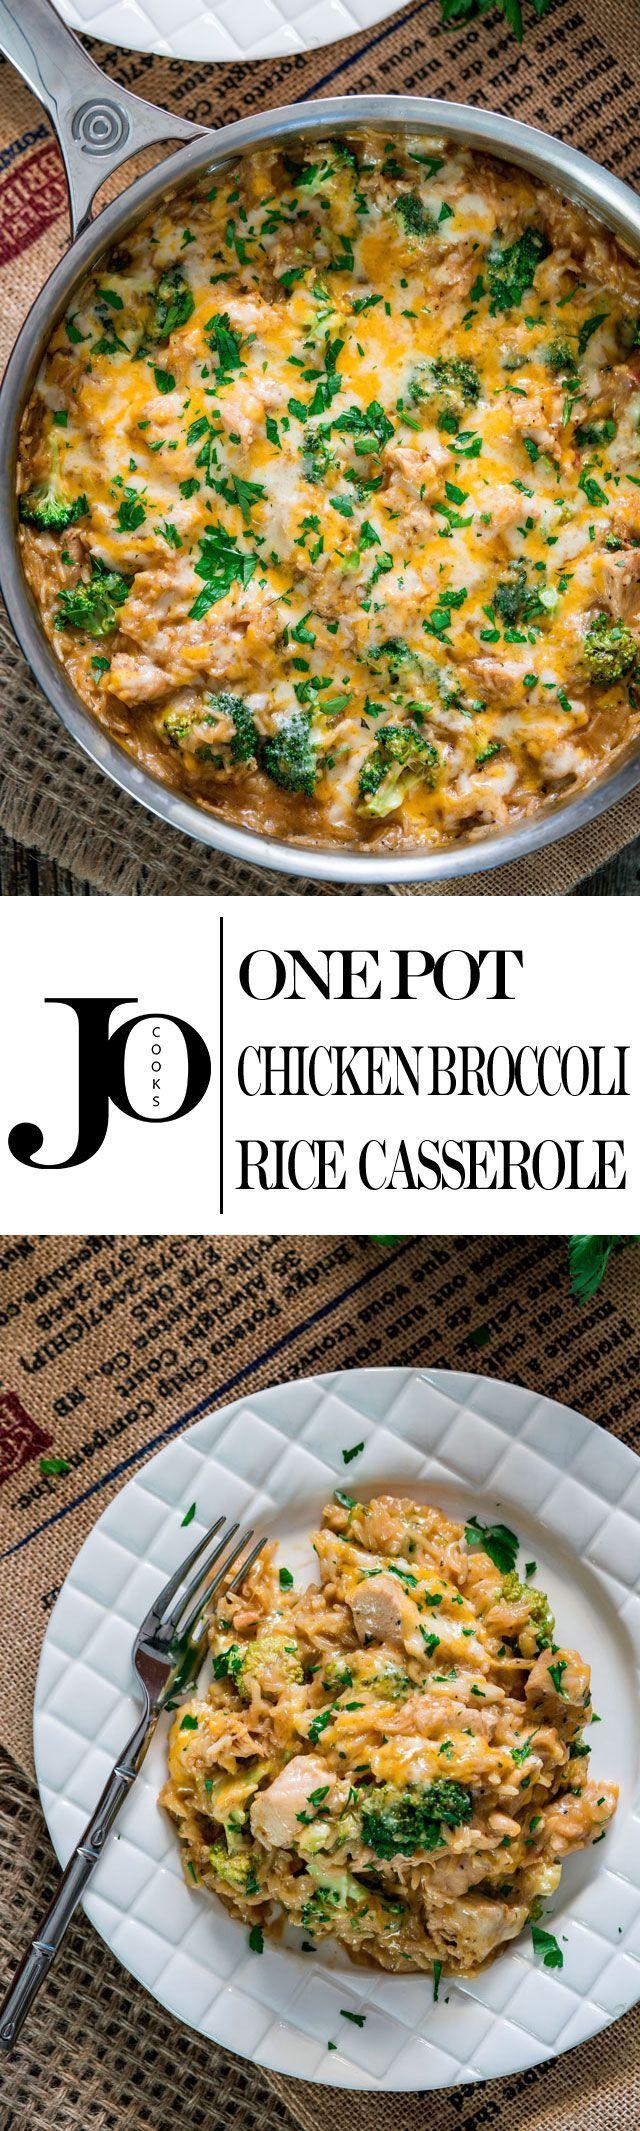 One Pot Cheesy Chicken Broccoli and Rice Casserole - it's cheesy, it's…